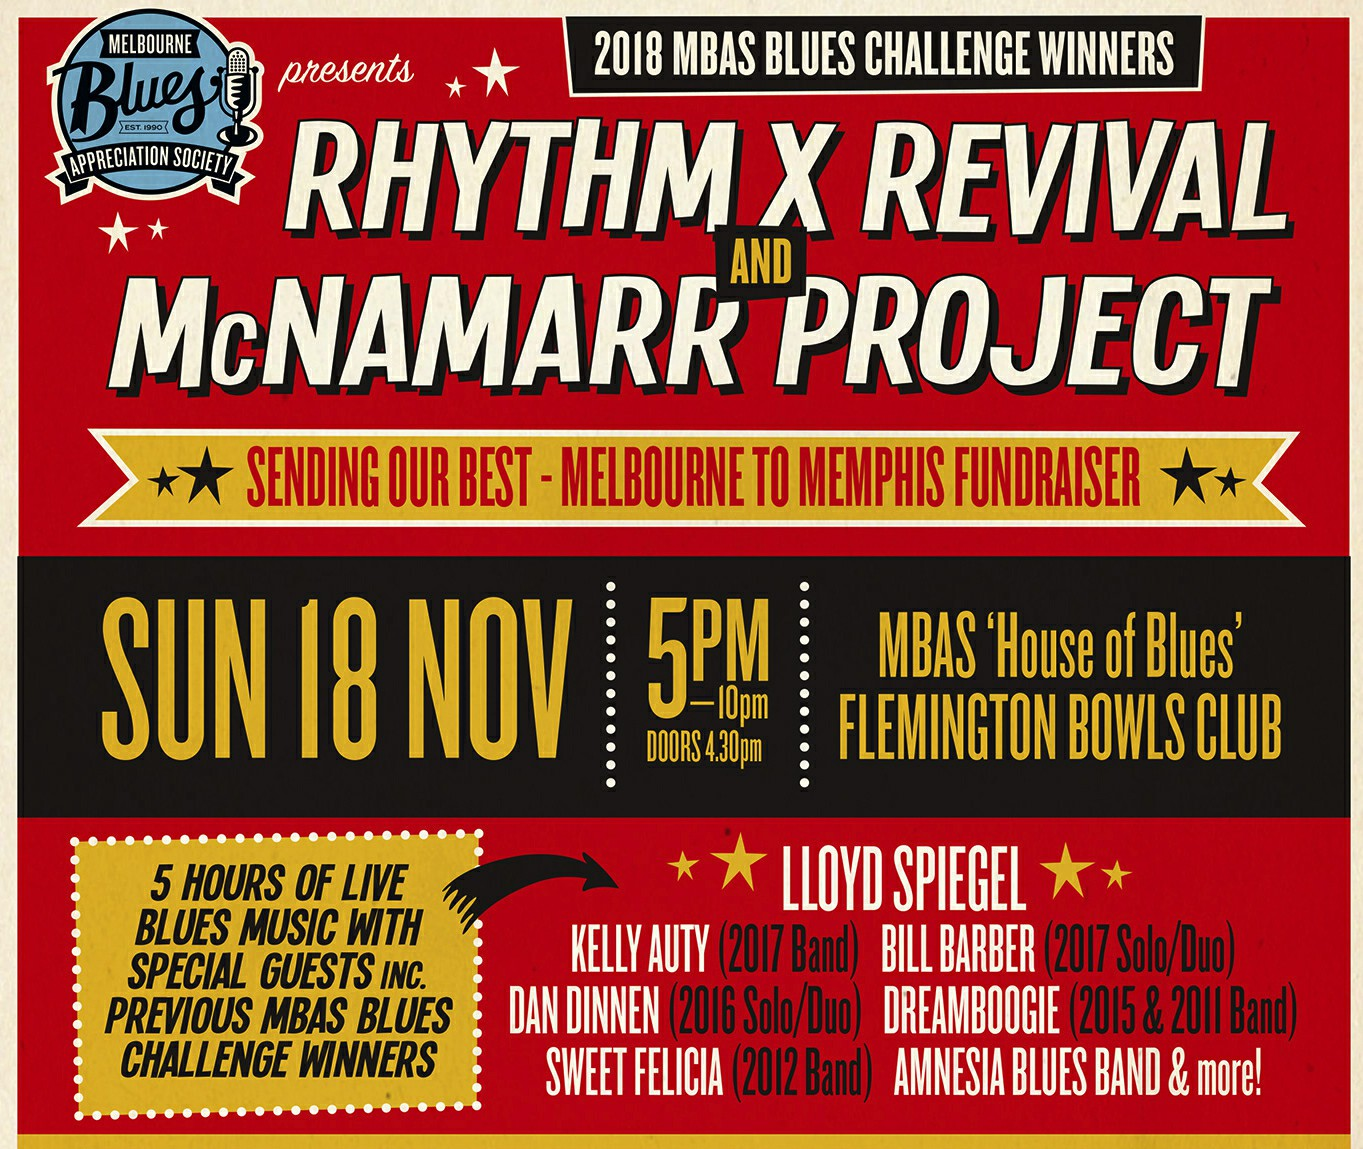 MBAS Melbourne To Memphis Fundraiser